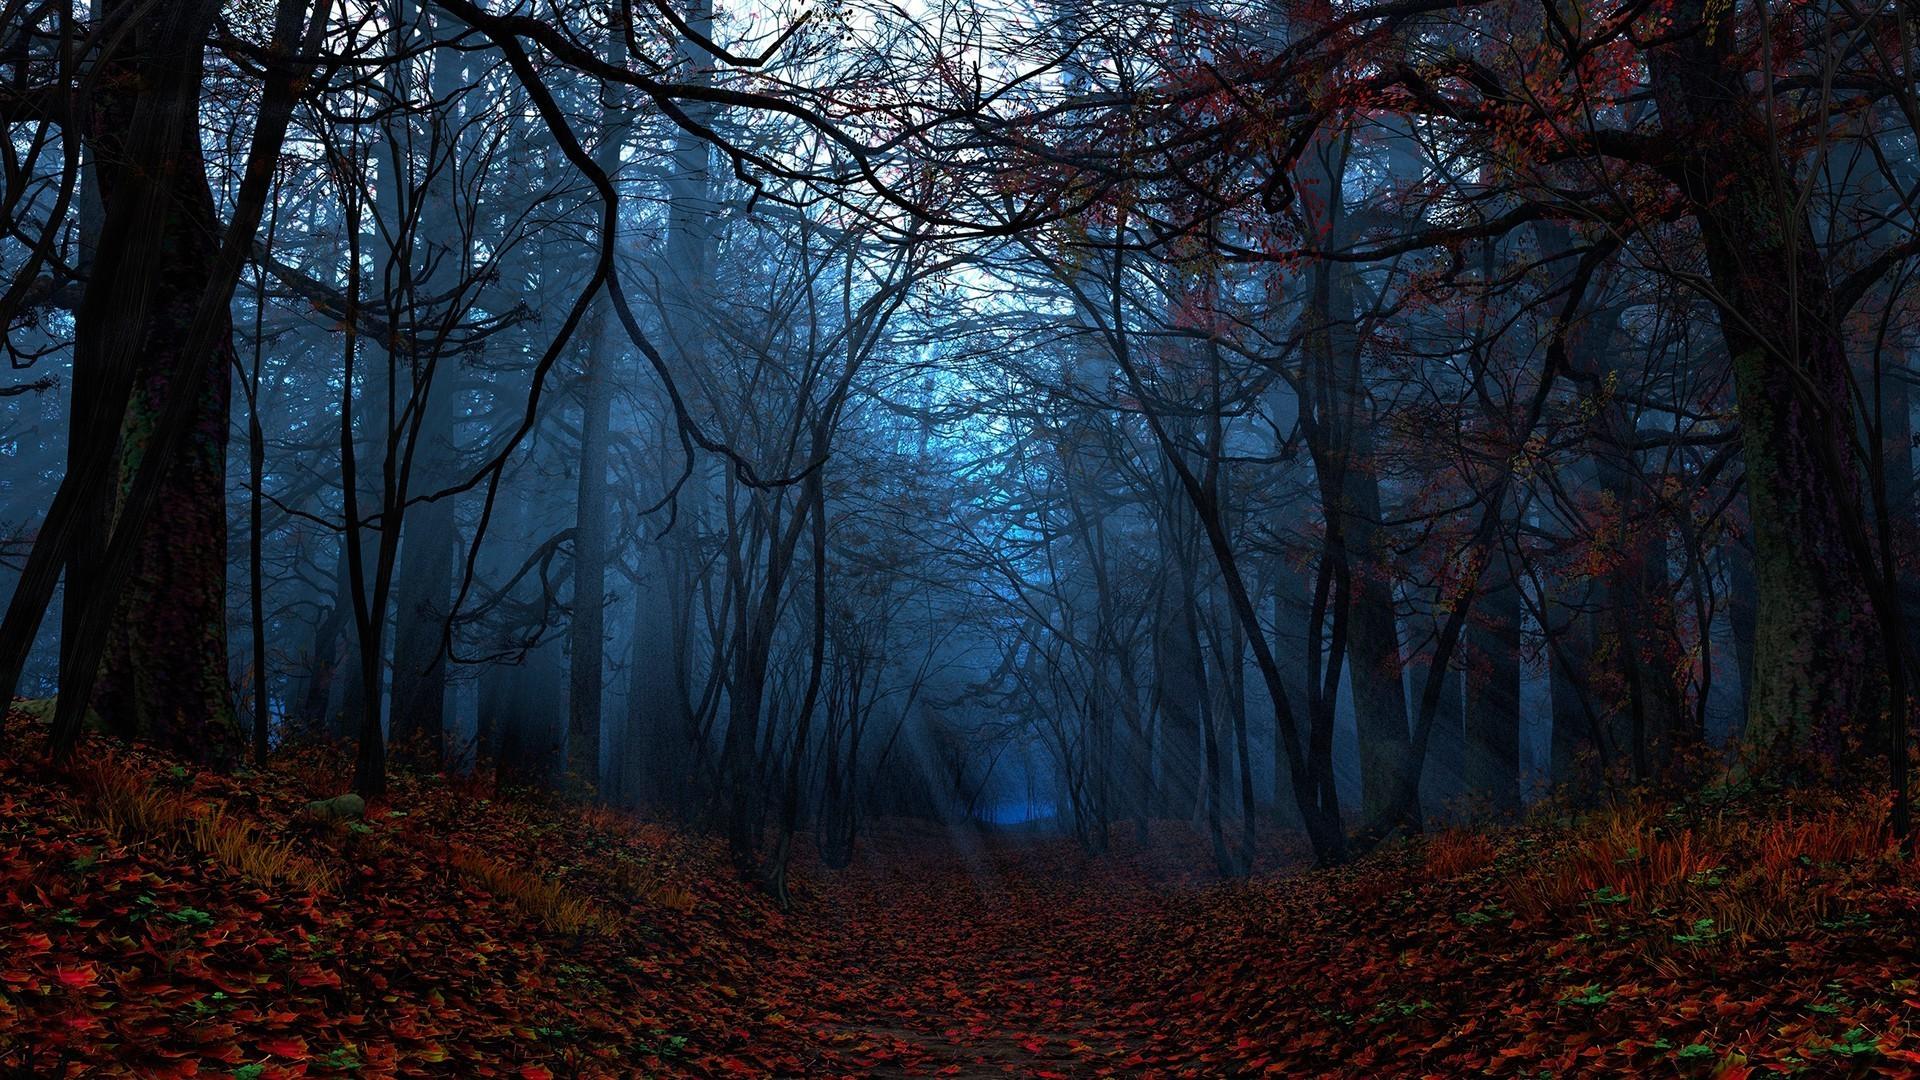 Autumn Forest Wallpaper for Desktop | PixelsTalk Net